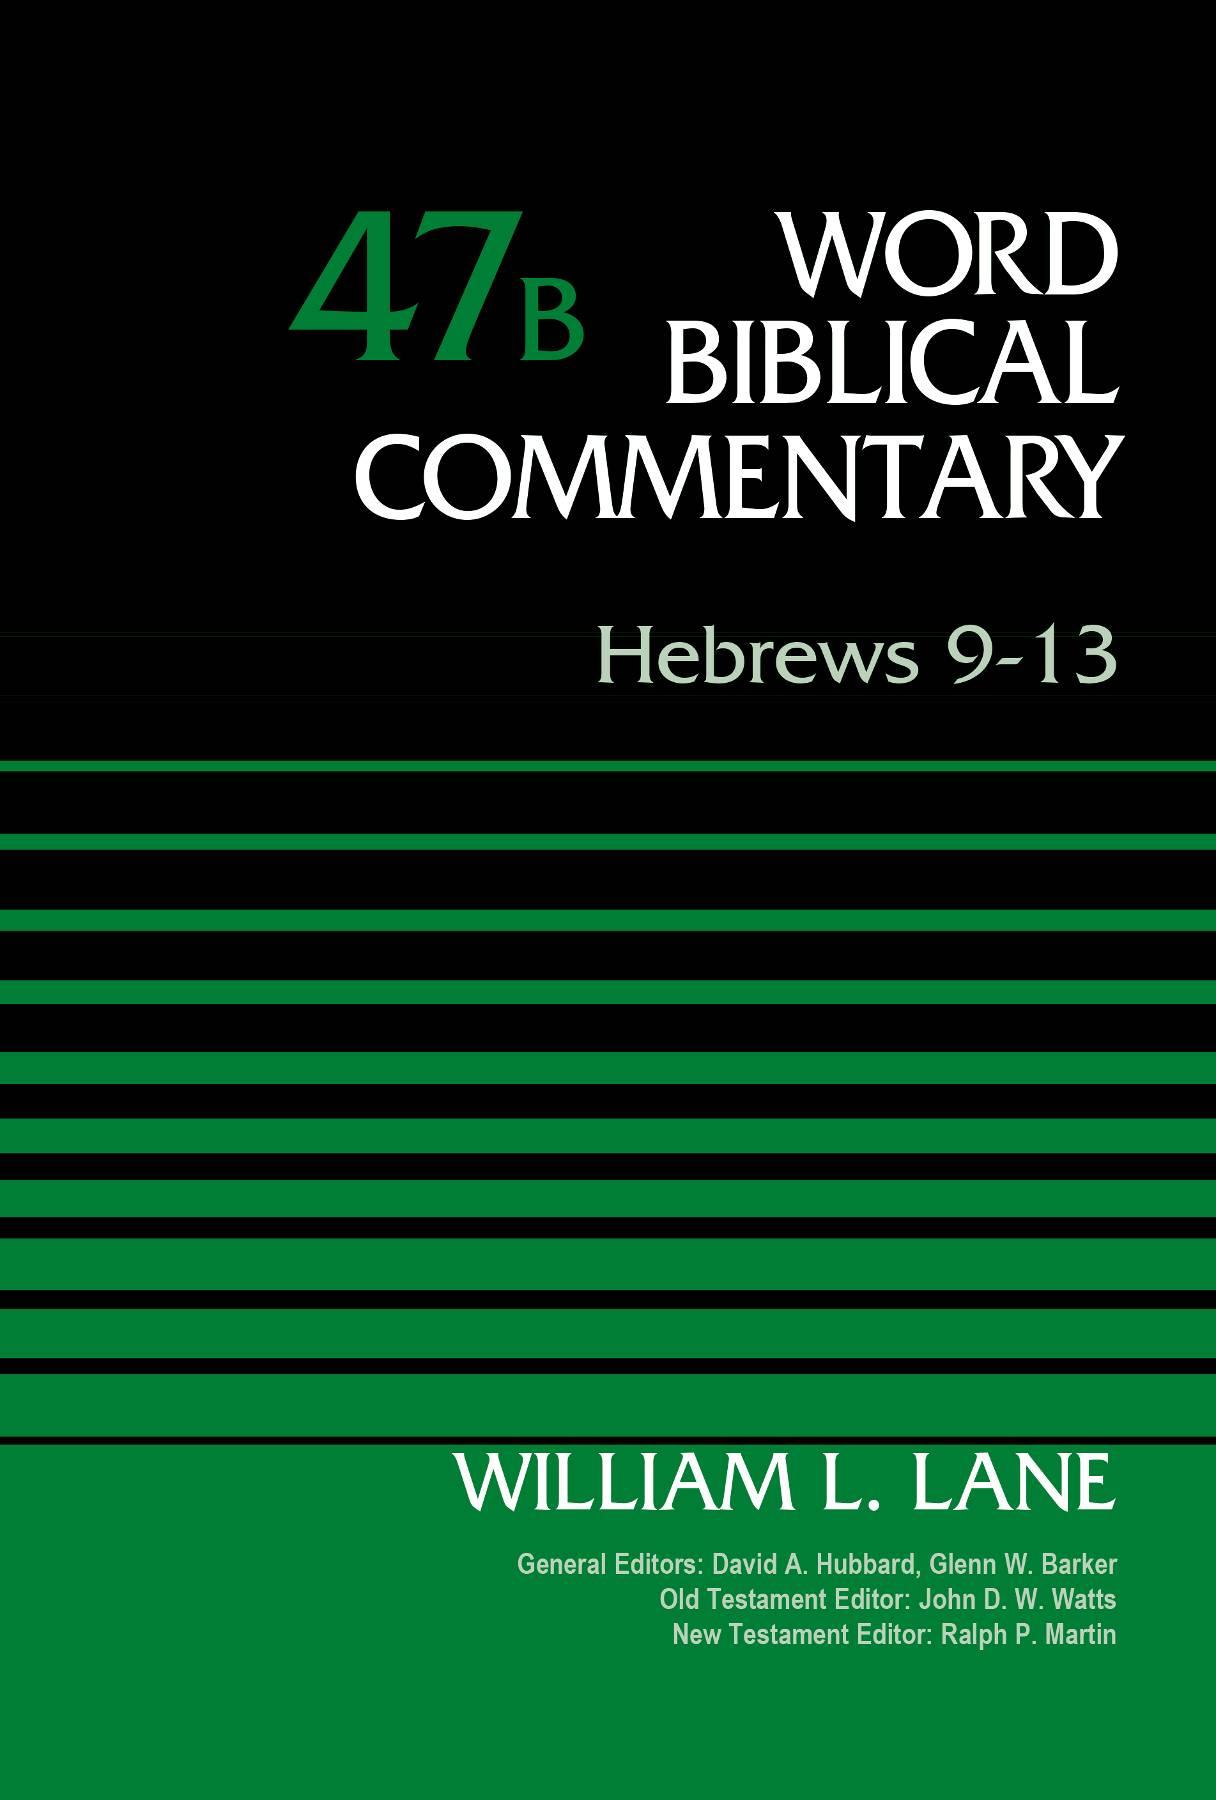 Hebrews 9-13, Volume 47B (Word Biblical Commentary)